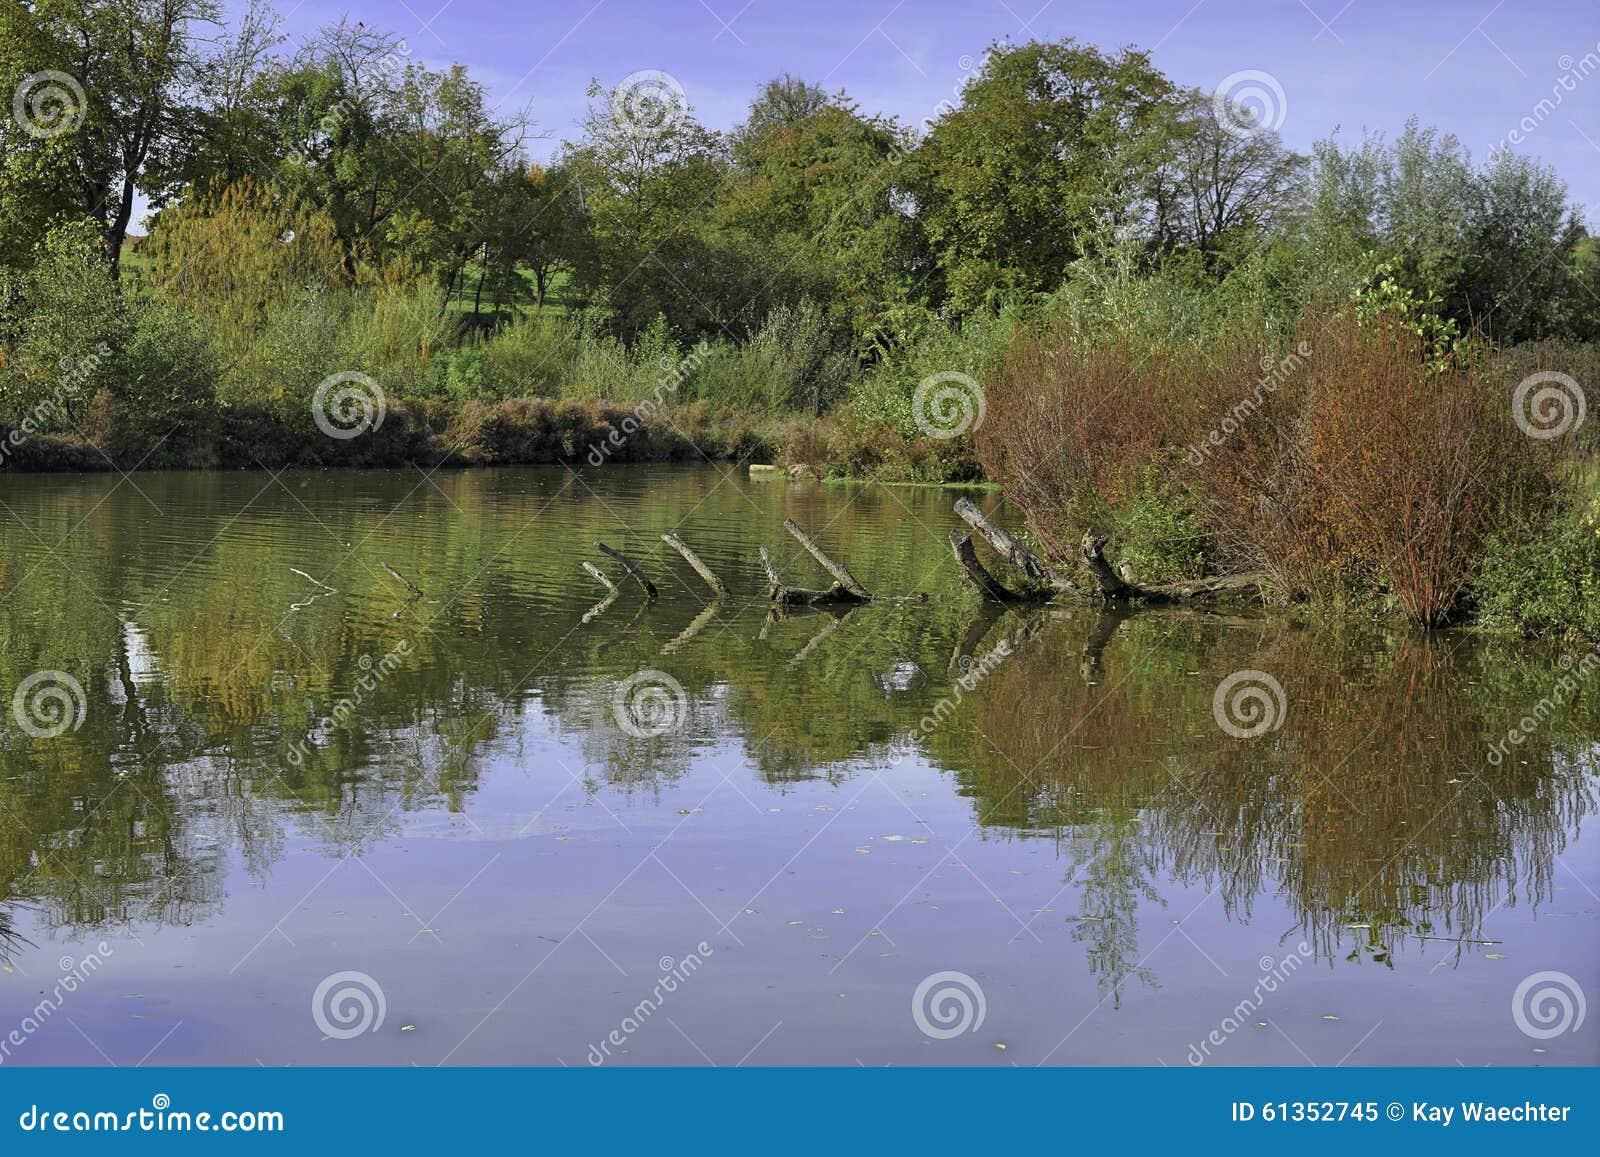 Neckar Wetlands Stock Photo - Image: 61352745